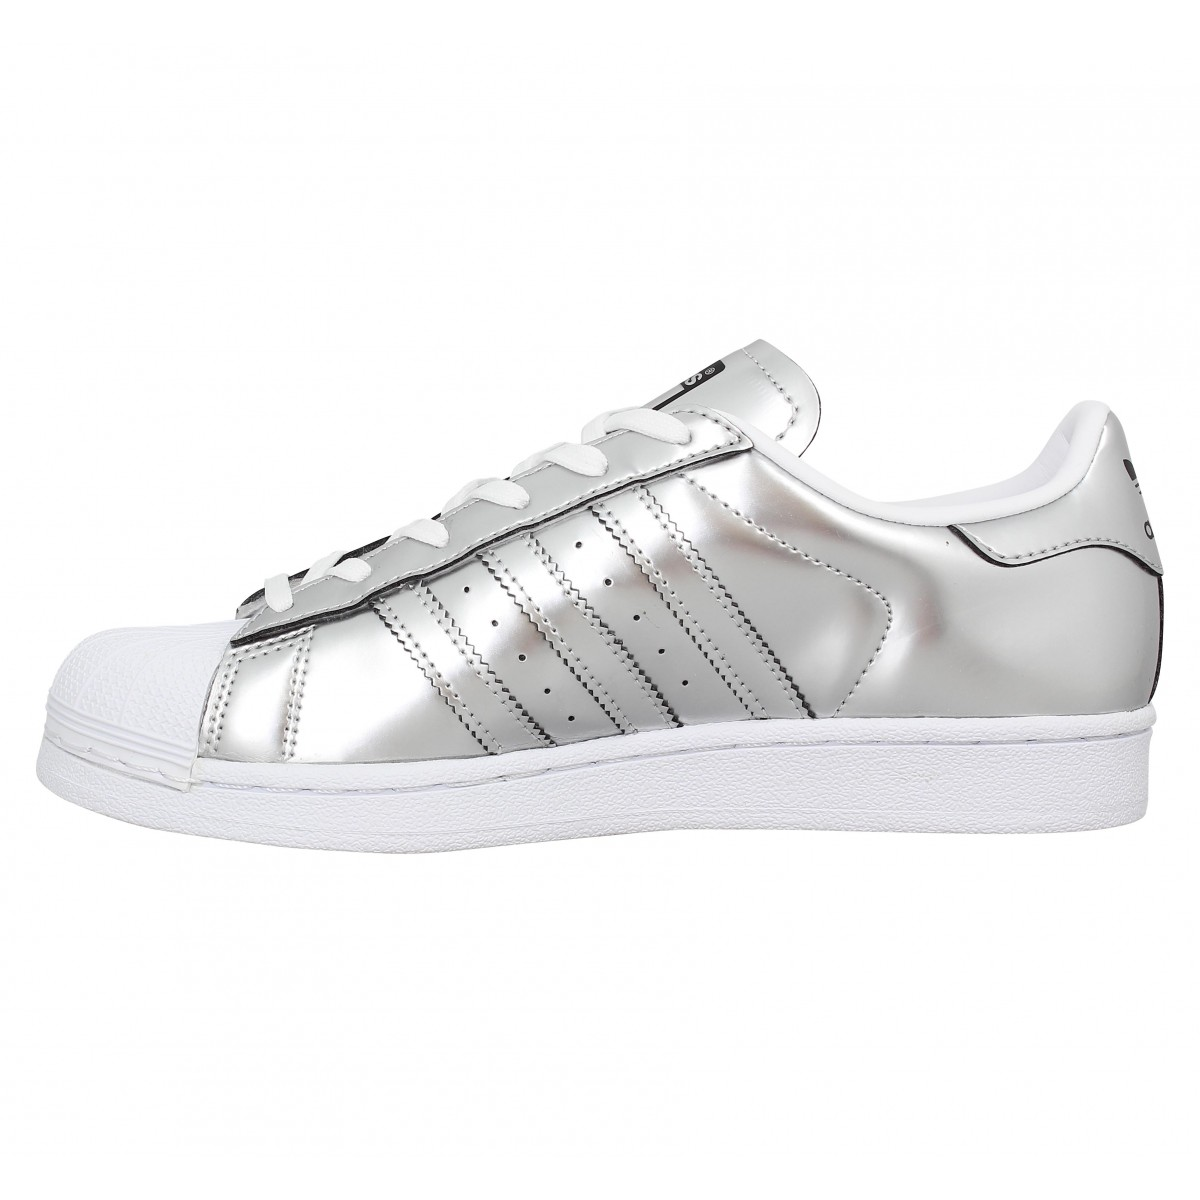 Chaussures Adidas superstar metal femme argent femme   Fanny ...